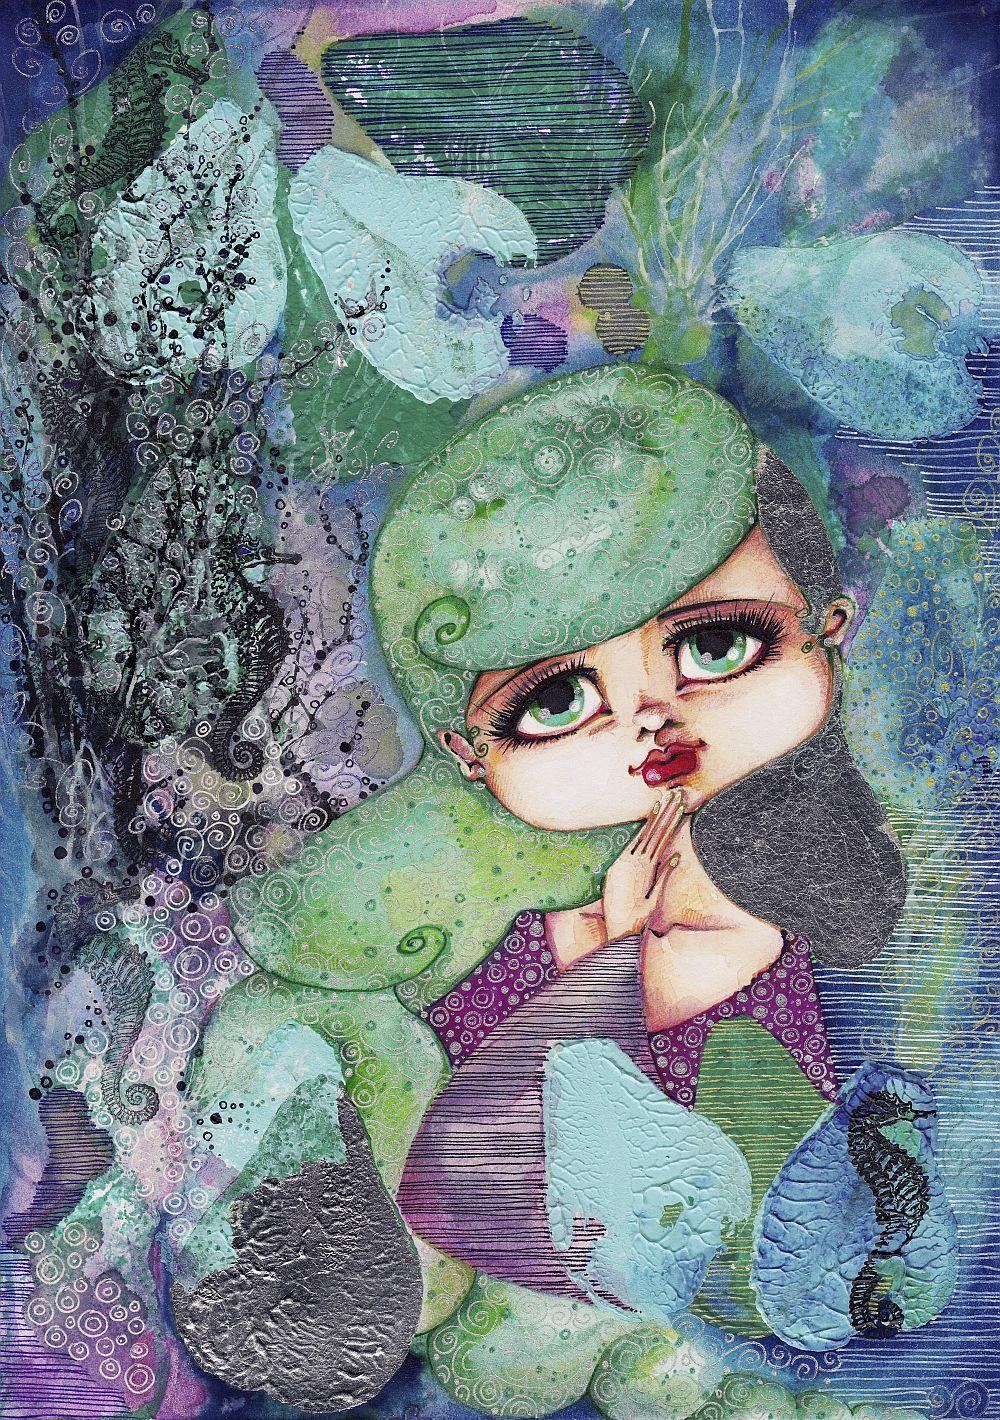 adelaparvu.com despre O povEstetica, expozitie la Pallets, lucrare Alin Para cruda artist Alina Borcea